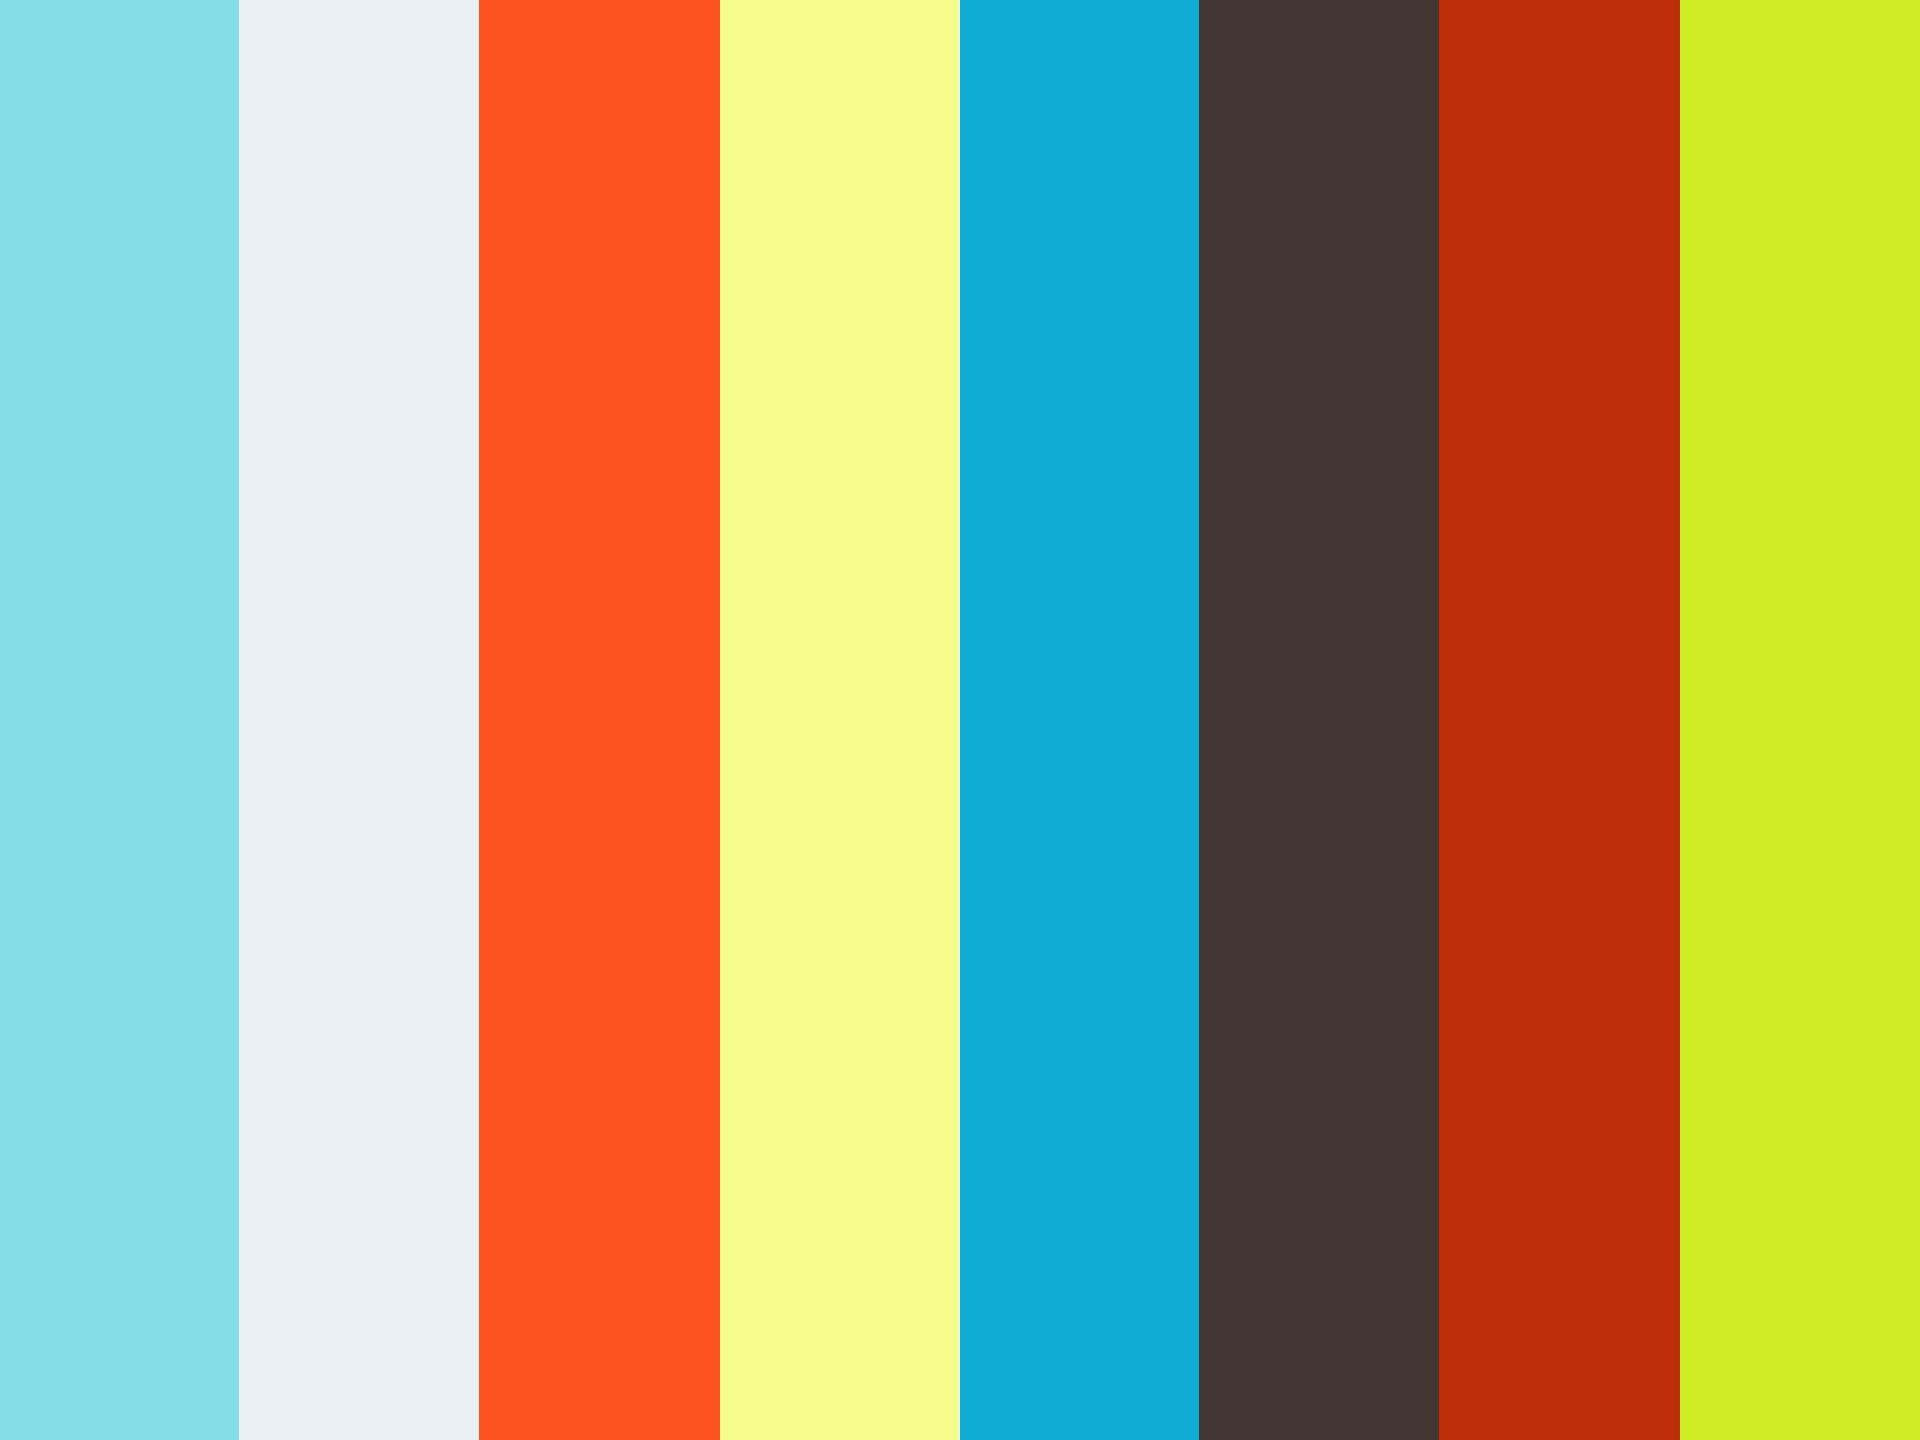 ROLLS ROYCE CULLILAN - BLACK - 2020